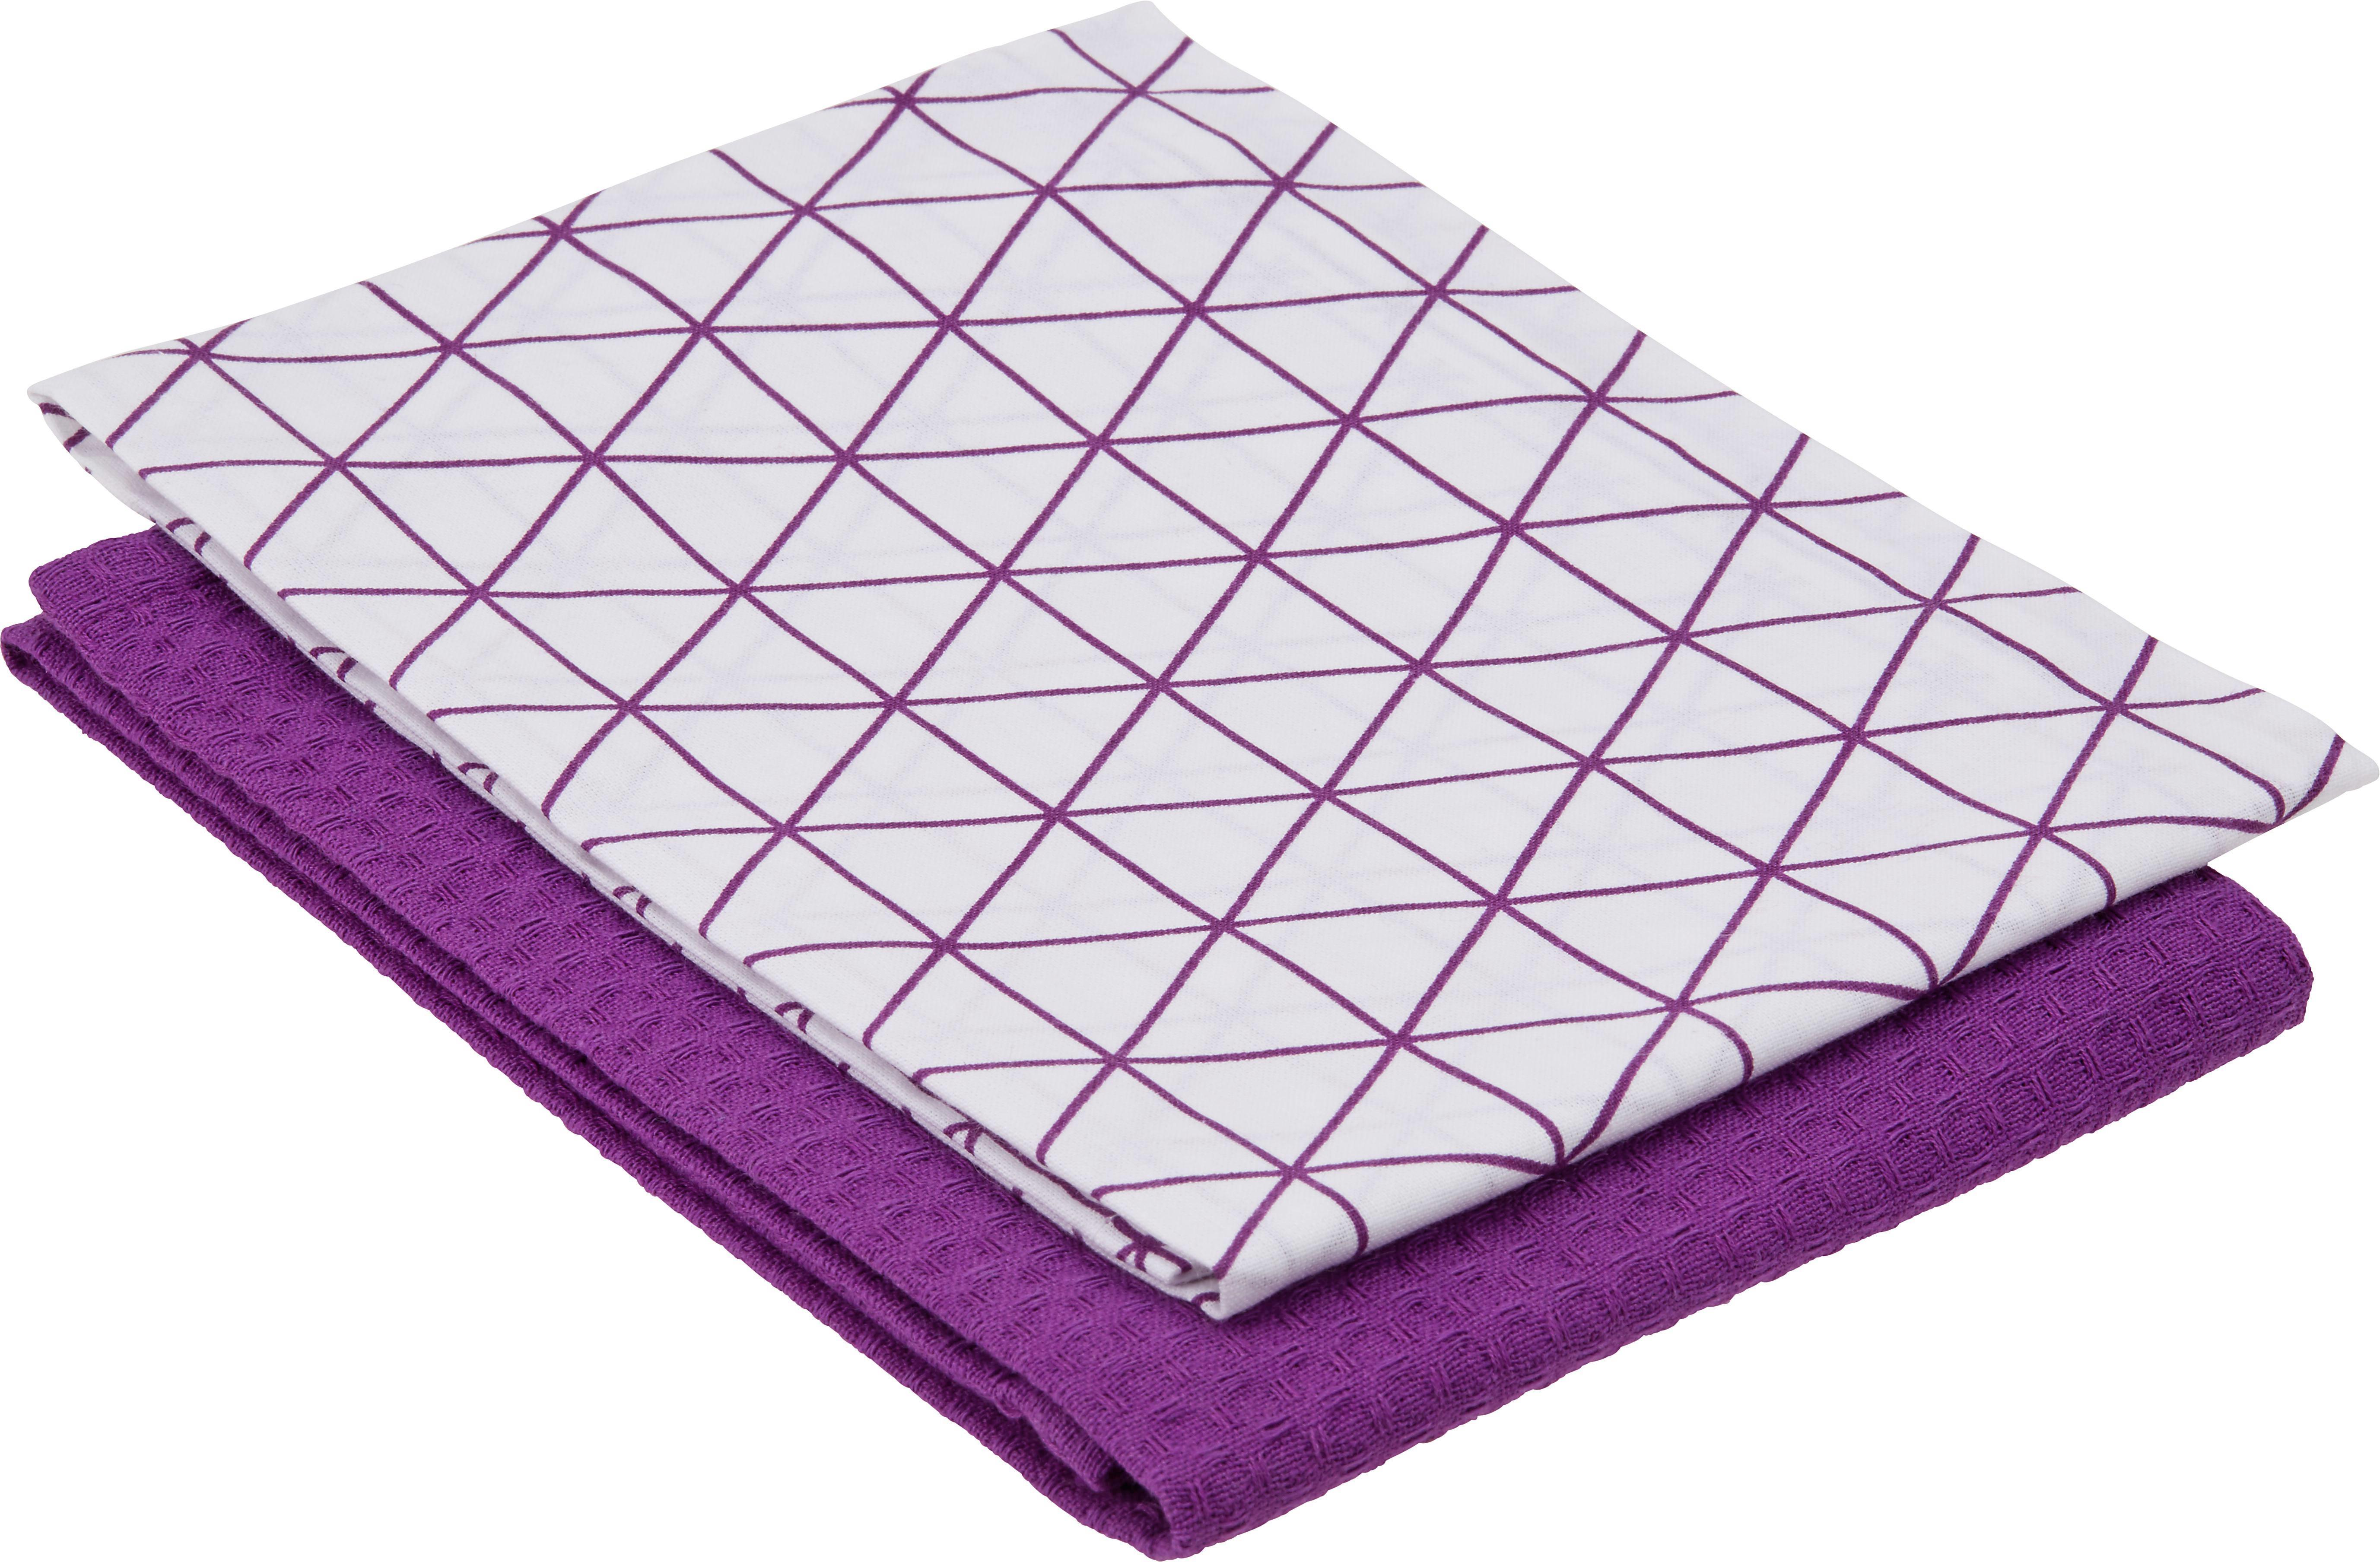 Geschirrtuch Kathi ca. 50x70cm - Lila, Textil (50/70cm) - MÖMAX modern living